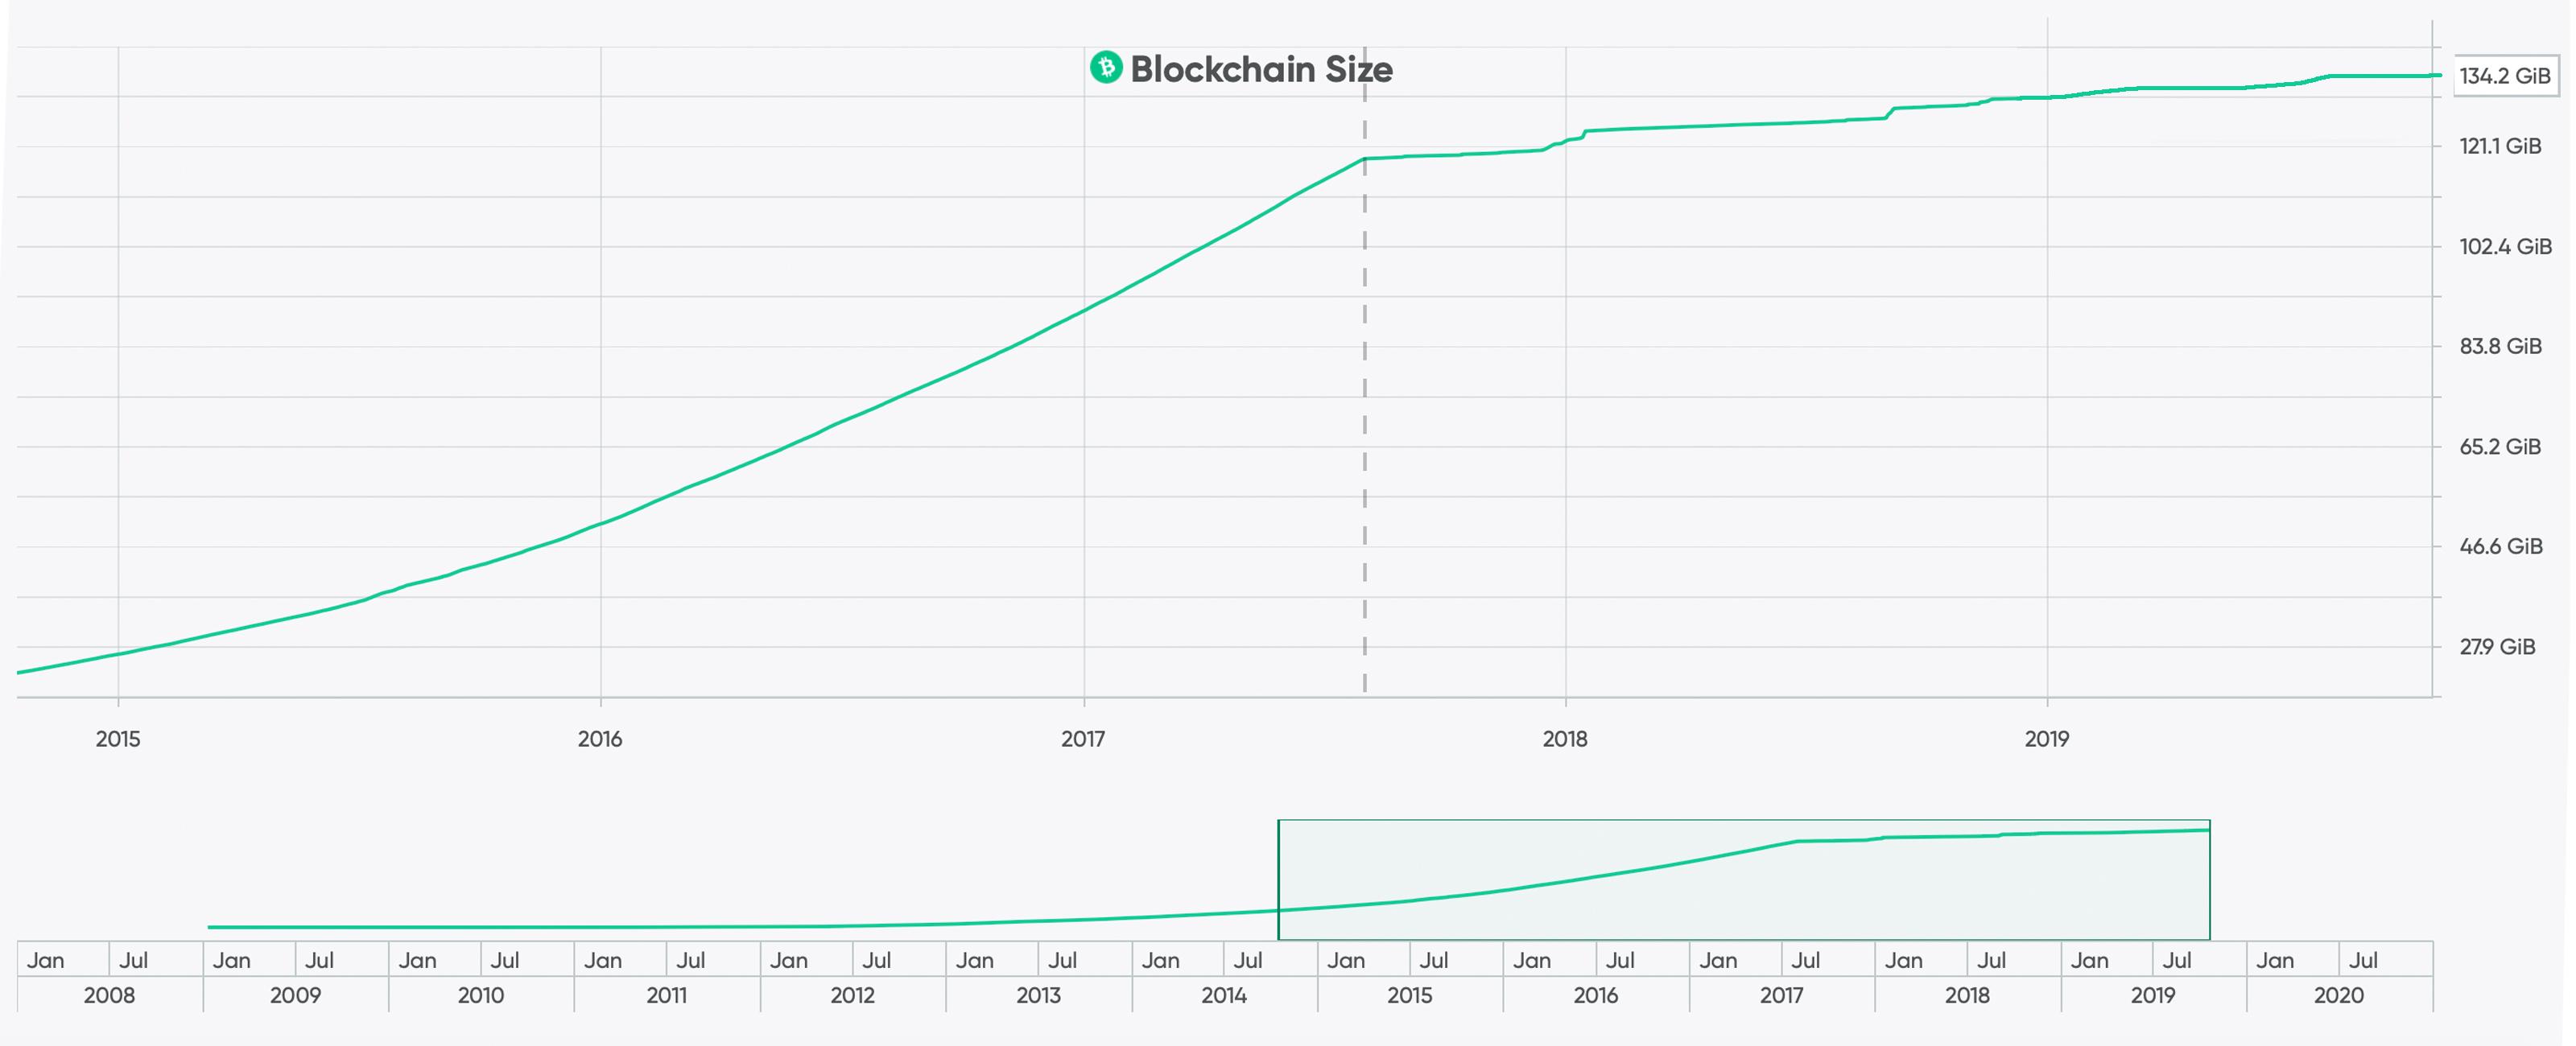 "Ejecución de Bitcoin Cash: una introducción a la operación de un Nodo completo ""ancho ="" 3200 ""altura ="" 1300 ""srcset ="" https://blackswanfinances.com/wp-content/uploads/2019/10/bchsize.jpg 3200w, https://news.bitcoin.com /wp-content/uploads/2019/10/bchsize-300x122.jpg 300w, https://news.bitcoin.com/wp-content/uploads/2019/10/bchsize-768x312.jpg 768w, https: // noticias .bitcoin.com / wp-content / uploads / 2019/10 / bchsize-1024x416.jpg 1024w, https://news.bitcoin.com/wp-content/uploads/2019/10/bchsize-696x283.jpg 696w, https : //news.bitcoin.com/wp-content/uploads/2019/10/bchsize-1 392x566.jpg 1392w, https://news.bitcoin.com/wp-content/uploads/2019/10/bchsize-1068x434.jpg 1068w, https://news.bitcoin.com/wp-content/uploads/2019/ 10 / bchsize-1034x420.jpg 1034w ""tamaños ="" (ancho máximo: 3200px) 100vw, 3200px"